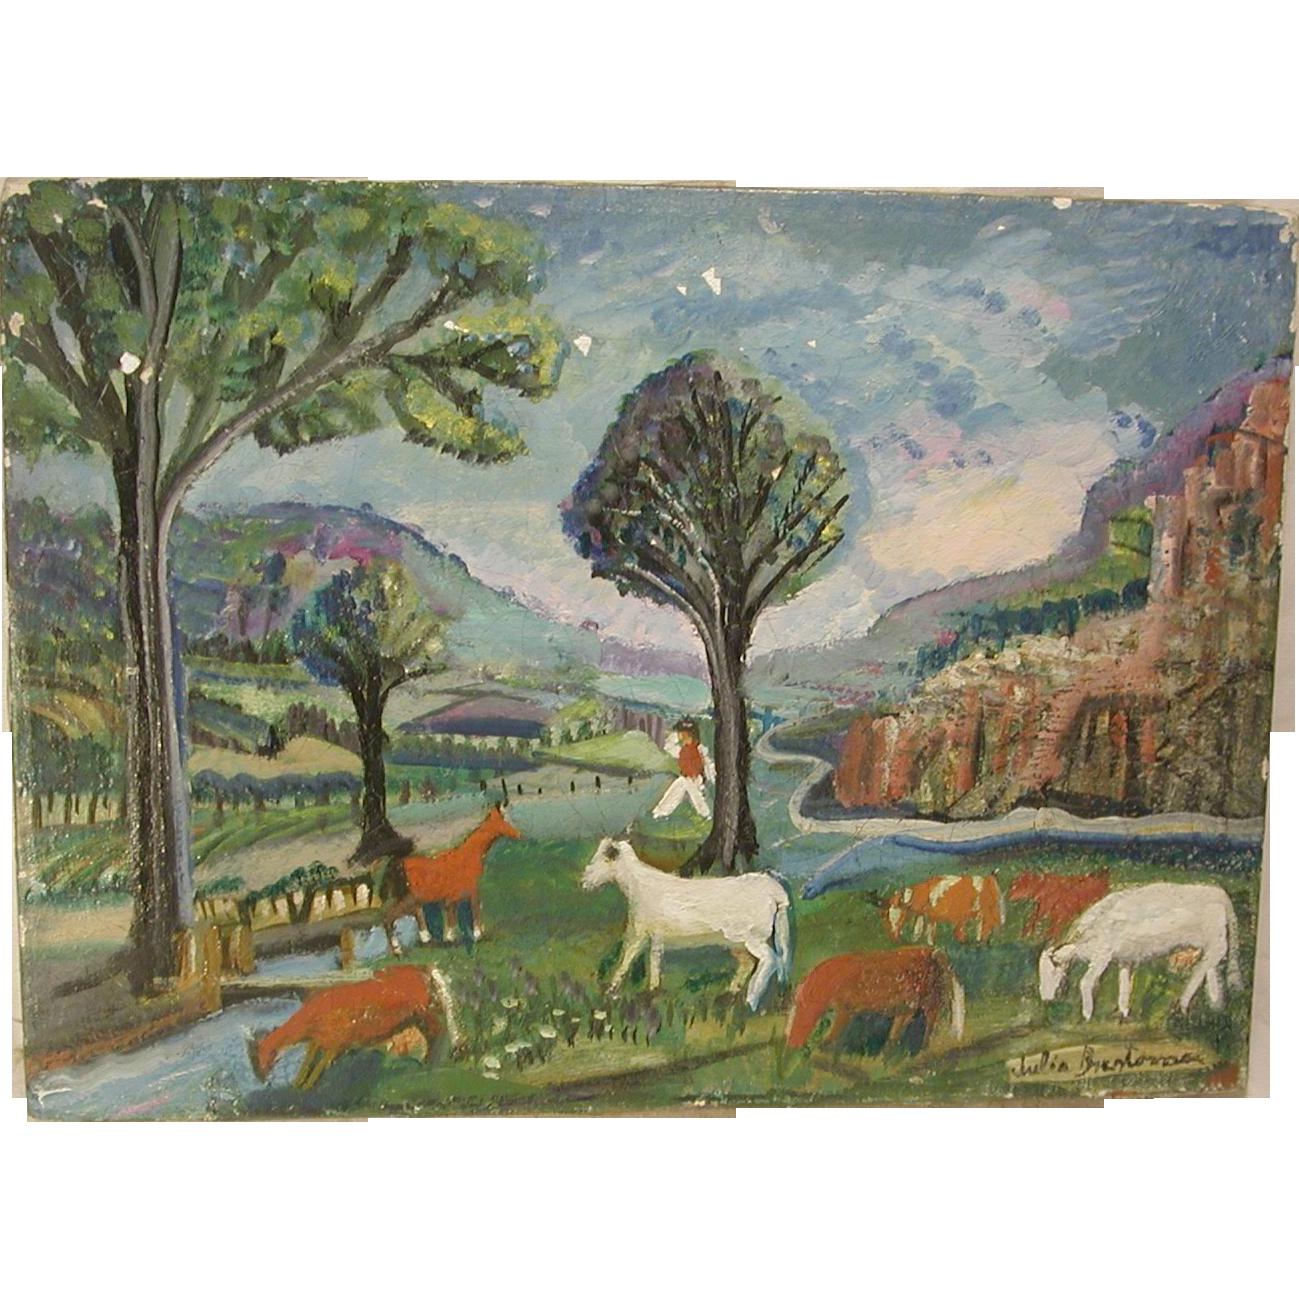 Landscape Lighting Ocala Fl: Naive Folk Art Landscape Painting Oil On Canvas Cows